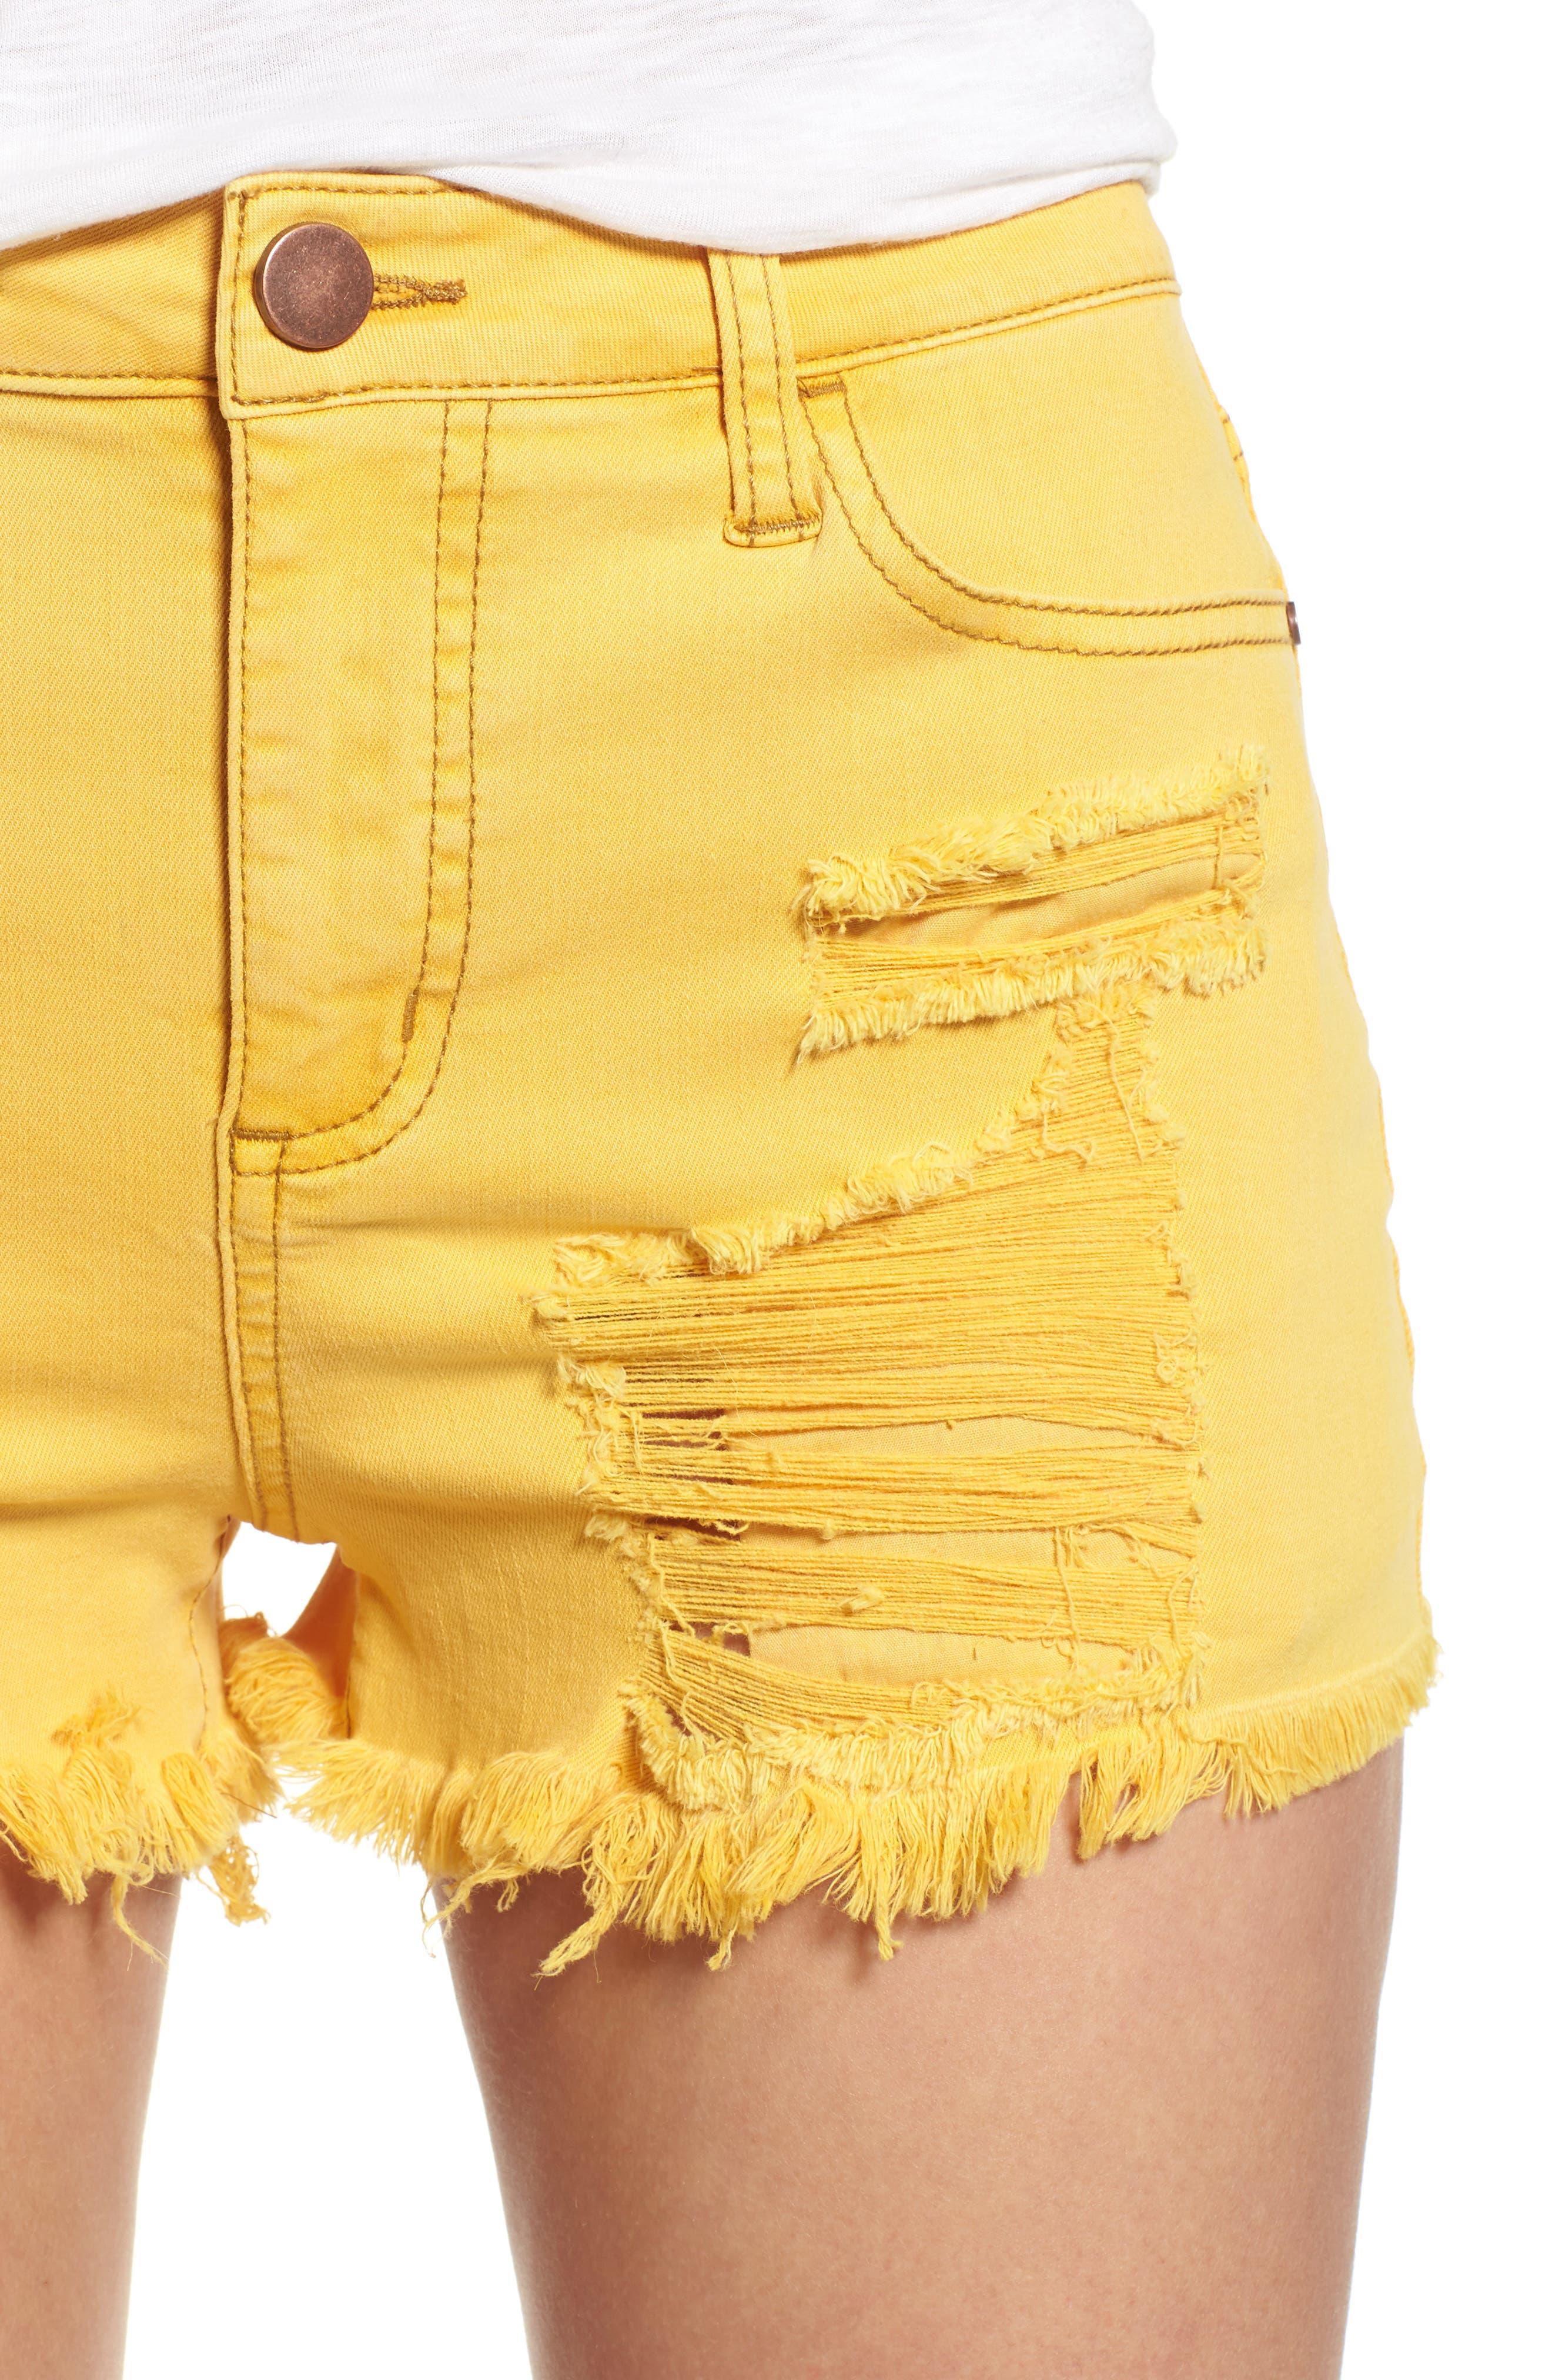 Decon Ripped Denim Shorts,                             Alternate thumbnail 4, color,                             701